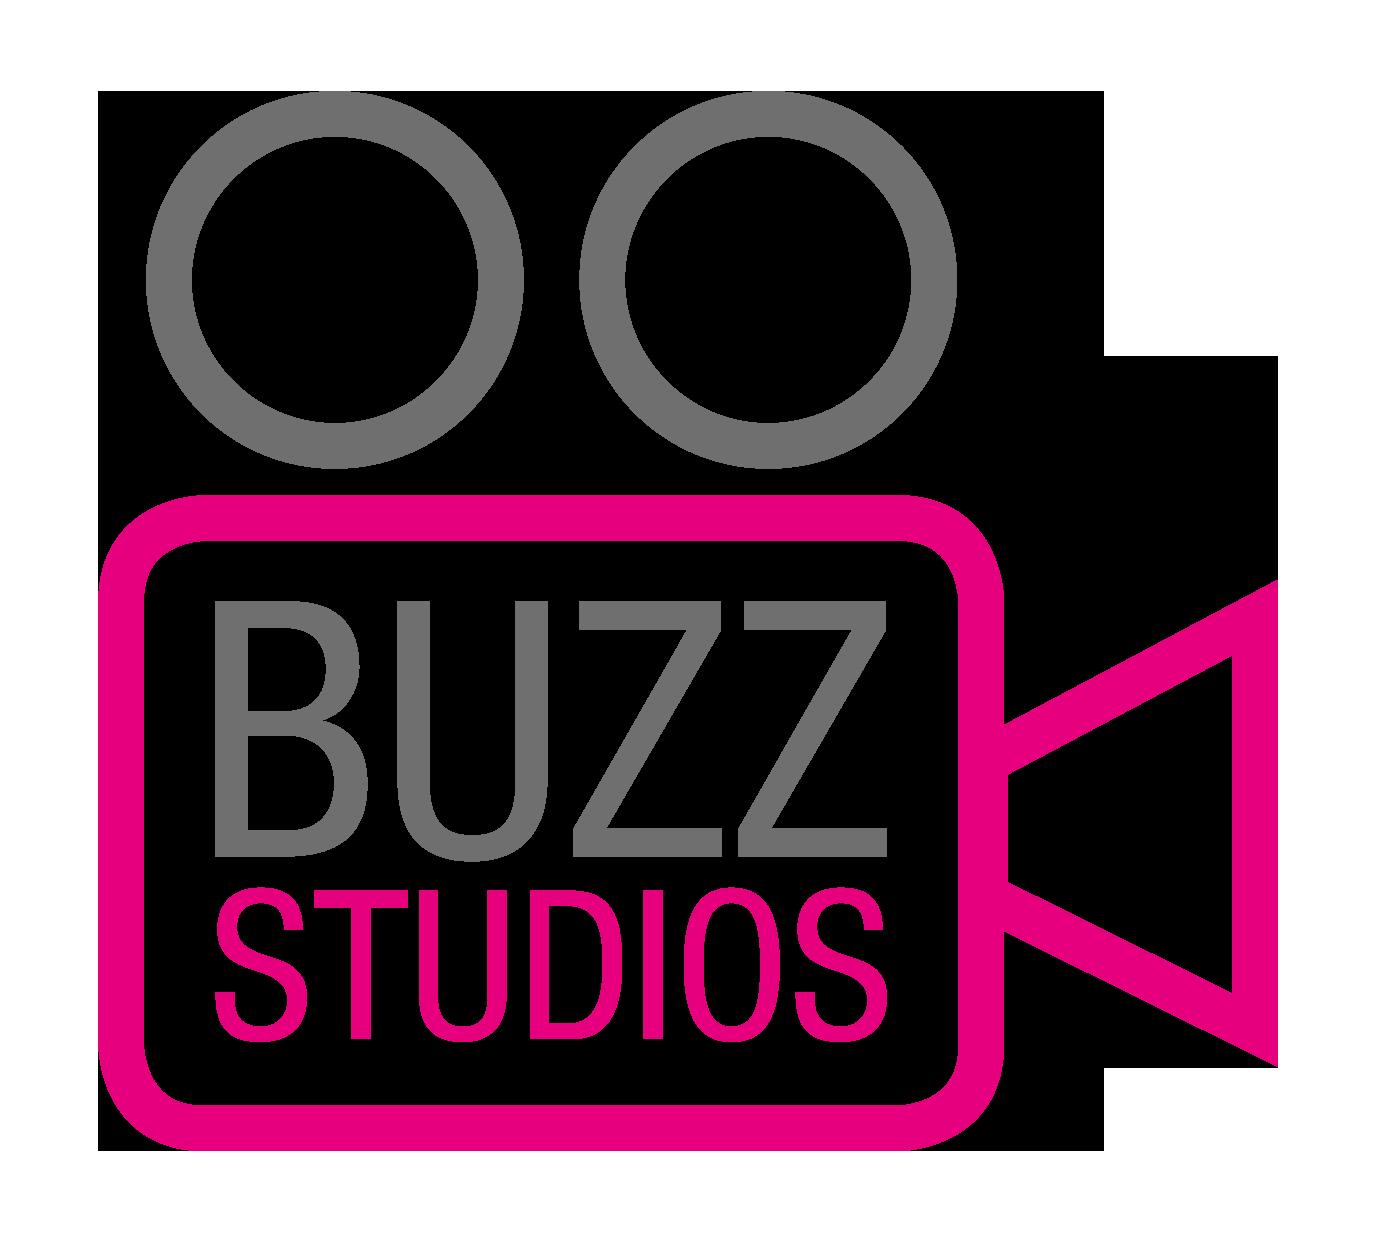 Buzz Studios